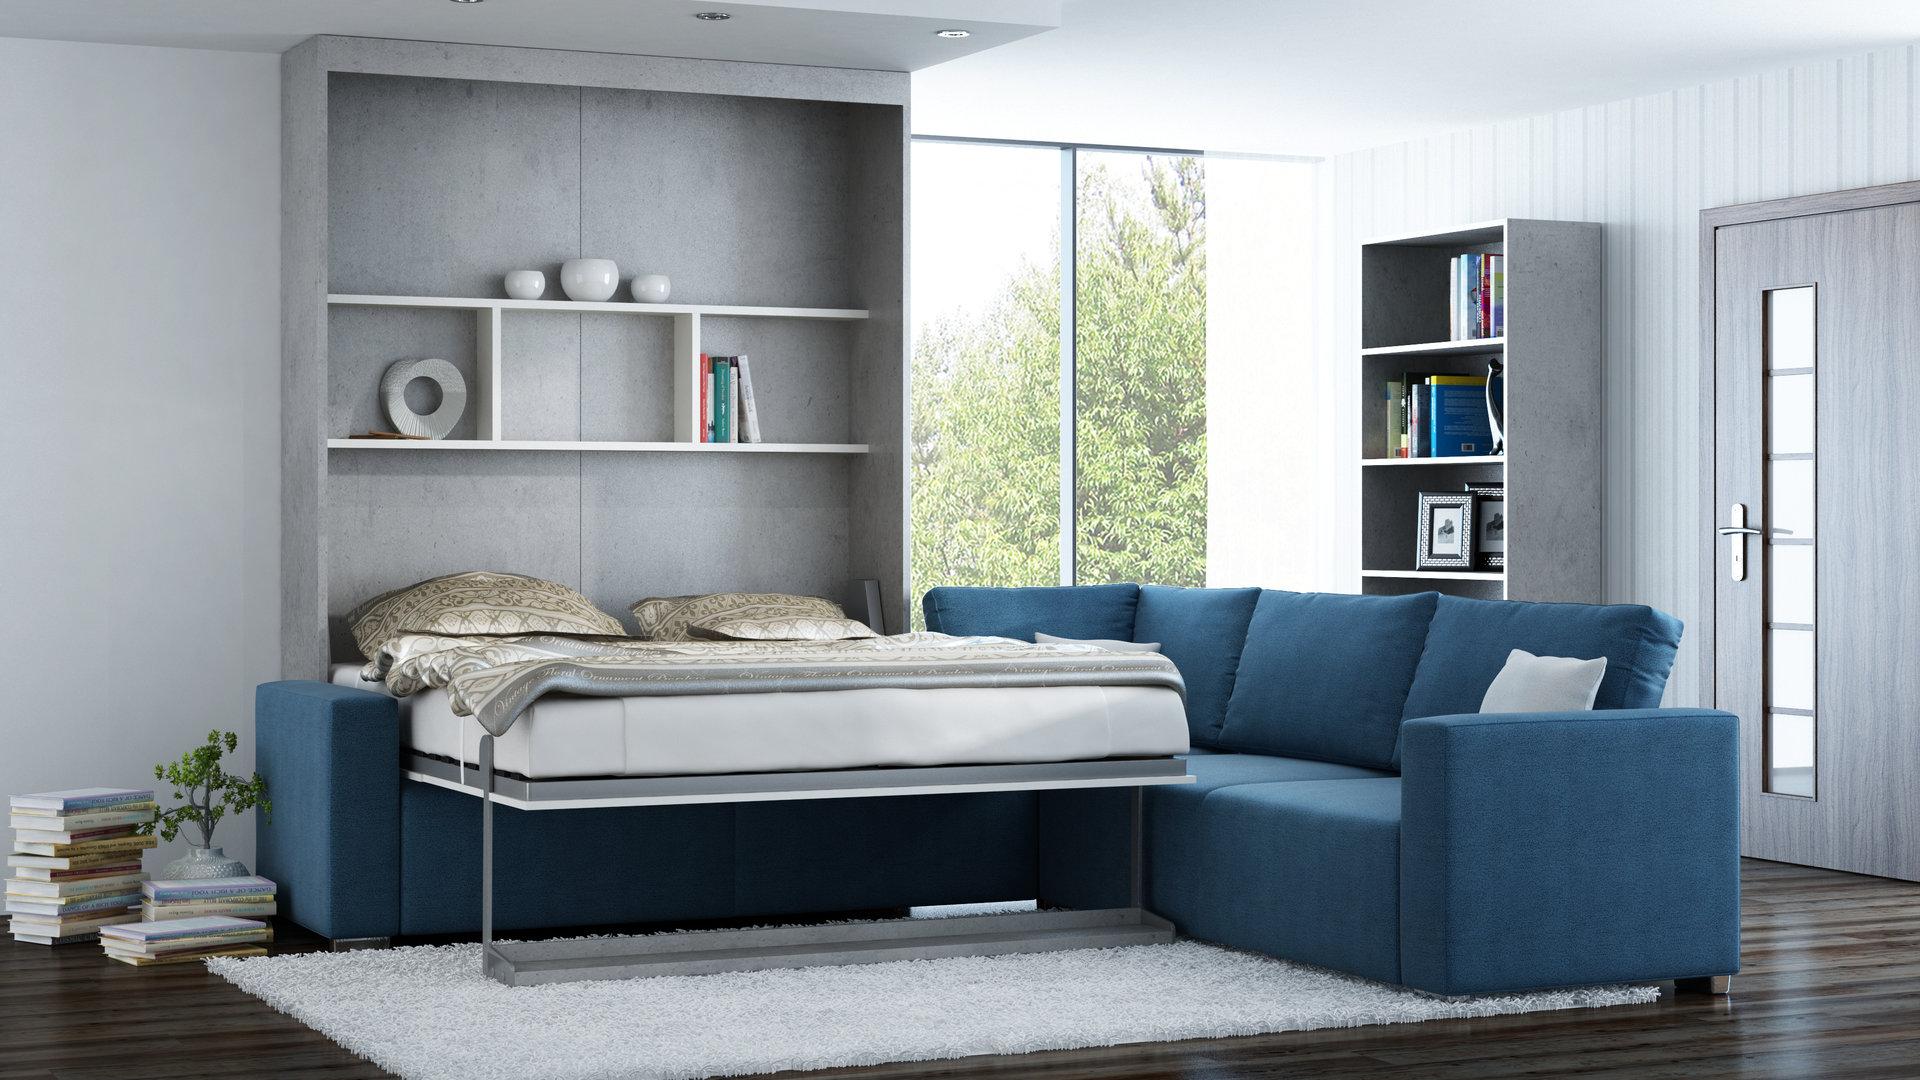 Sofa ecke cool sofa abdeckung fr polyester grau ecke for Kleine sofaecke